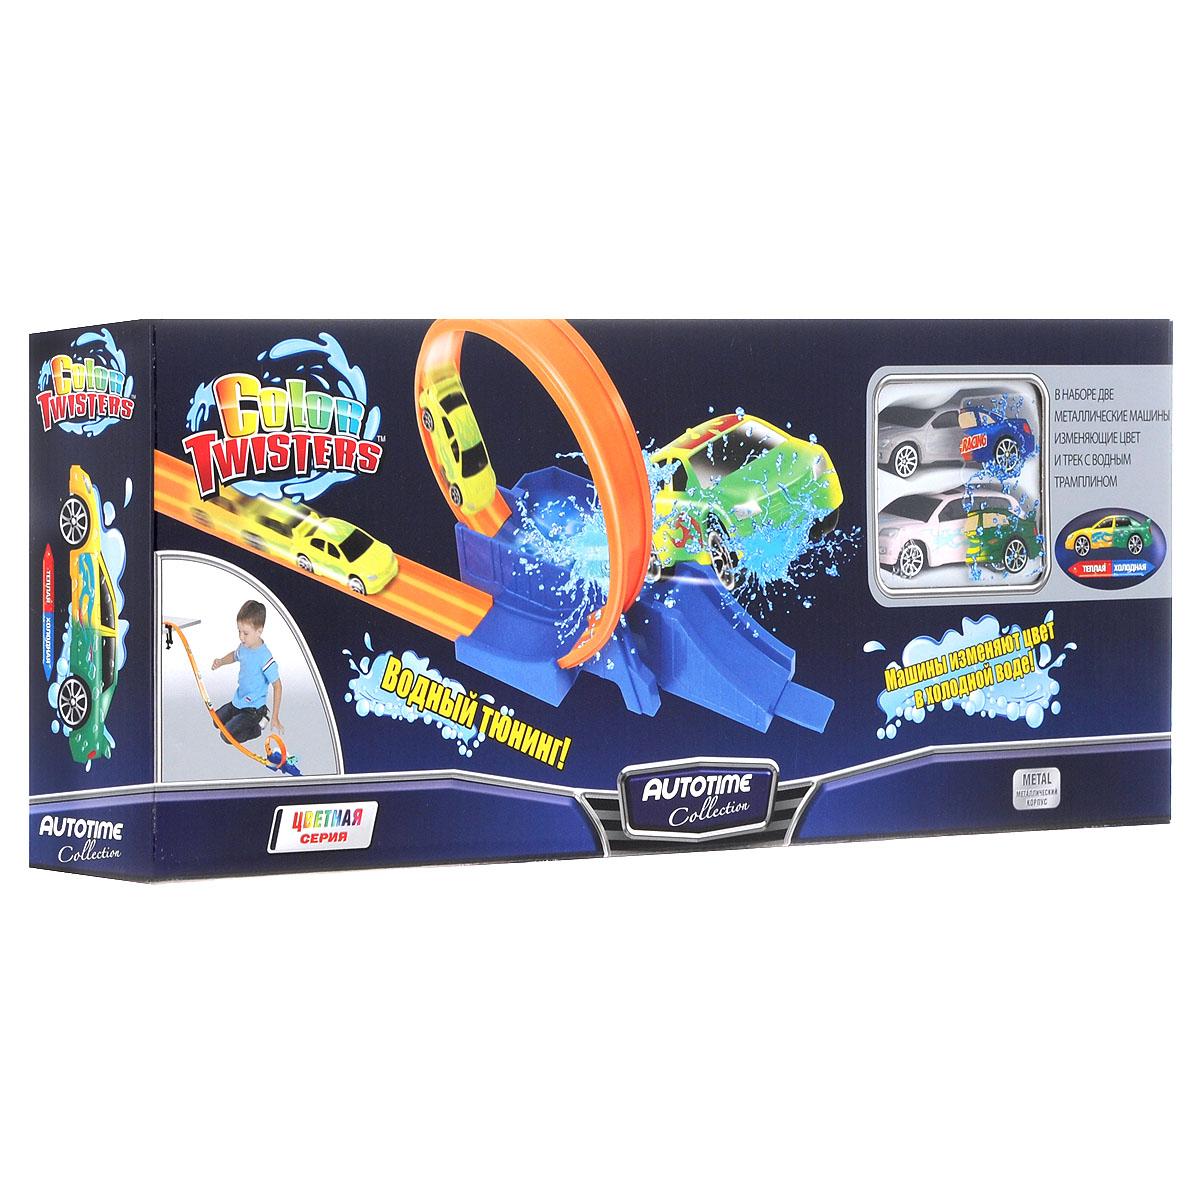 Autotime Игровой набор Color Twisters, с треком. 78179/02-RUS машинки autotime машина uaz 31514 ваи